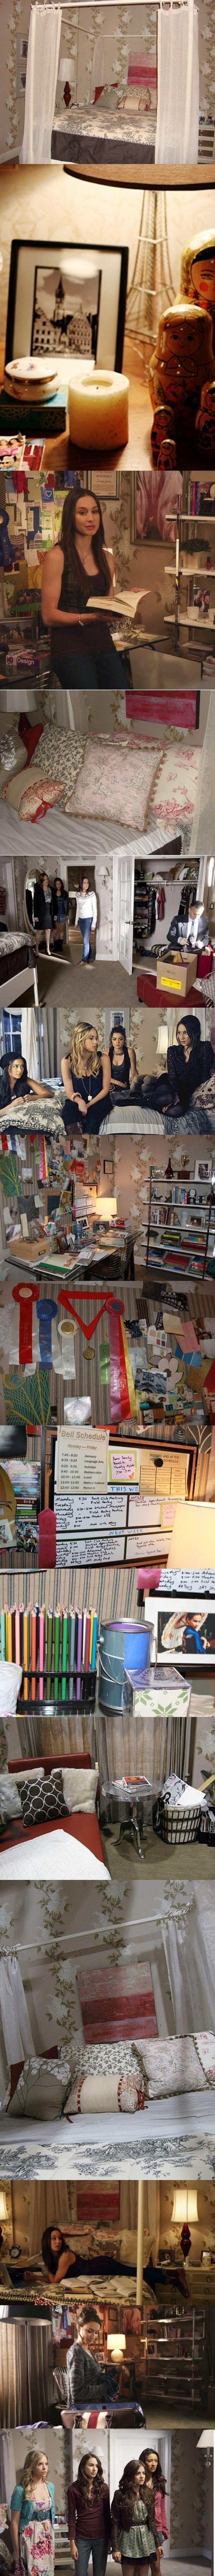 Spencer's Room in Pretty Little Liars | Pretty Little Liars